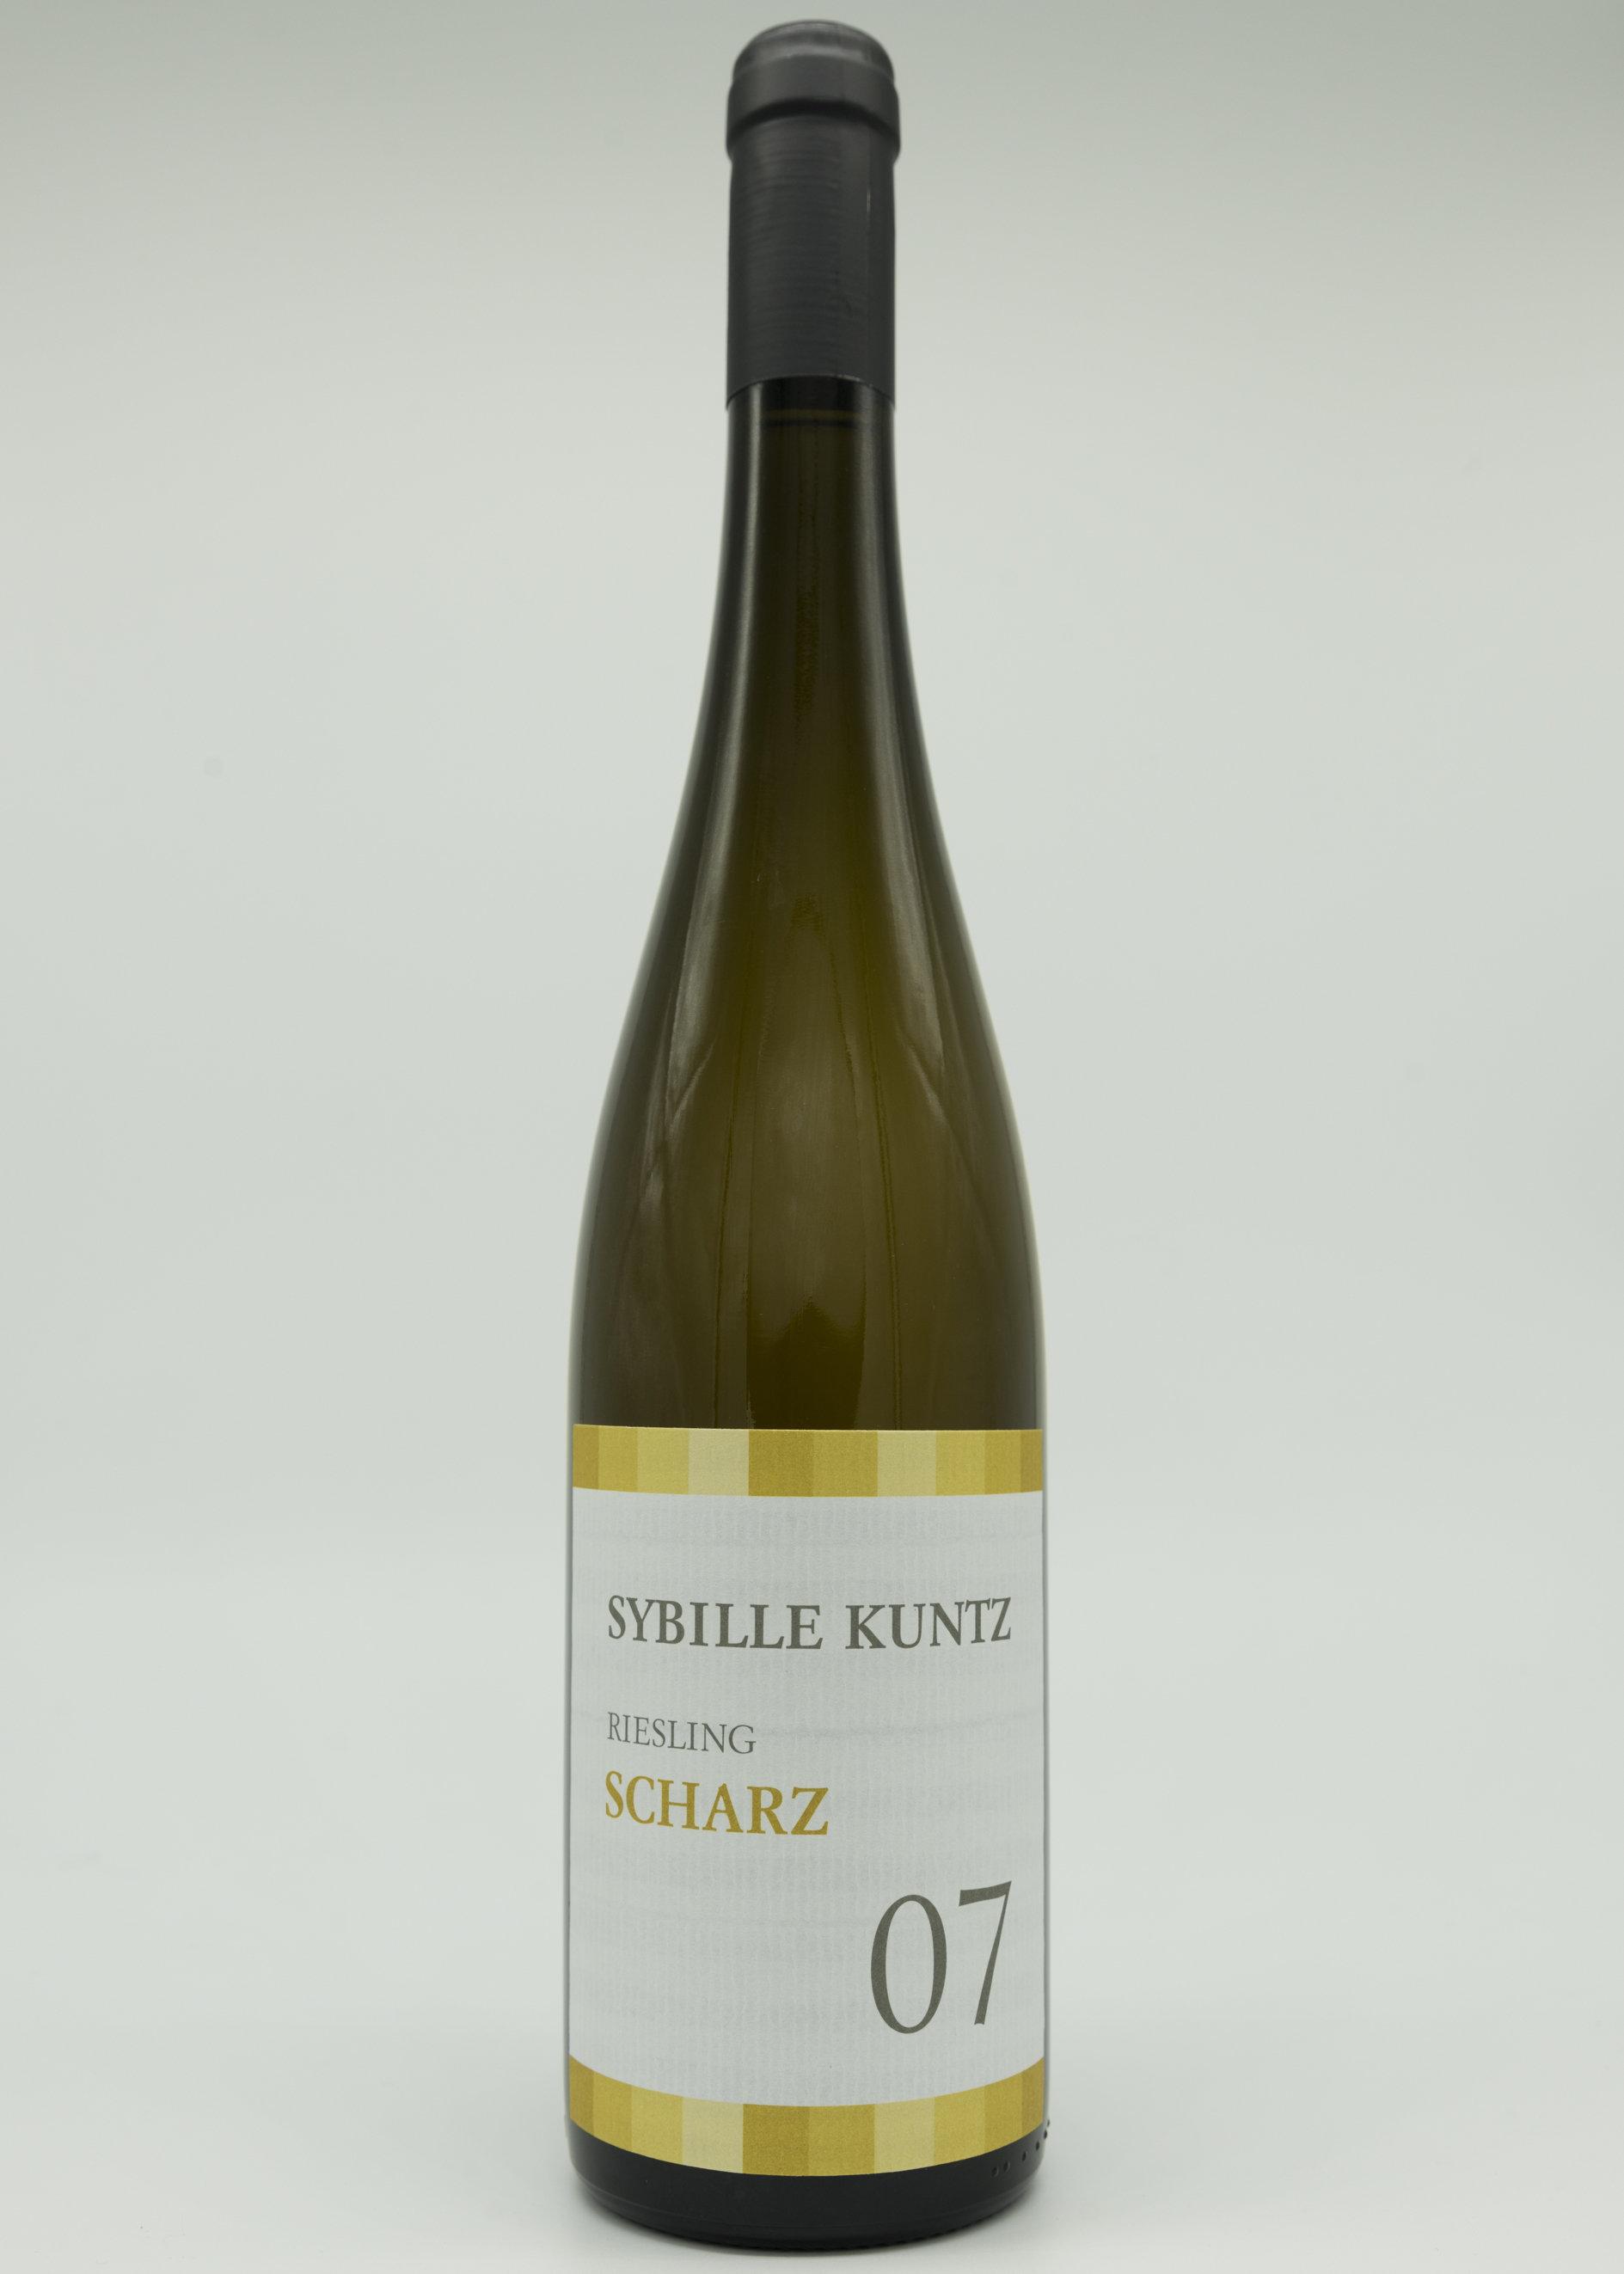 Sybille Kuntz Riesling 'Scharz' Auslese 2007 00036